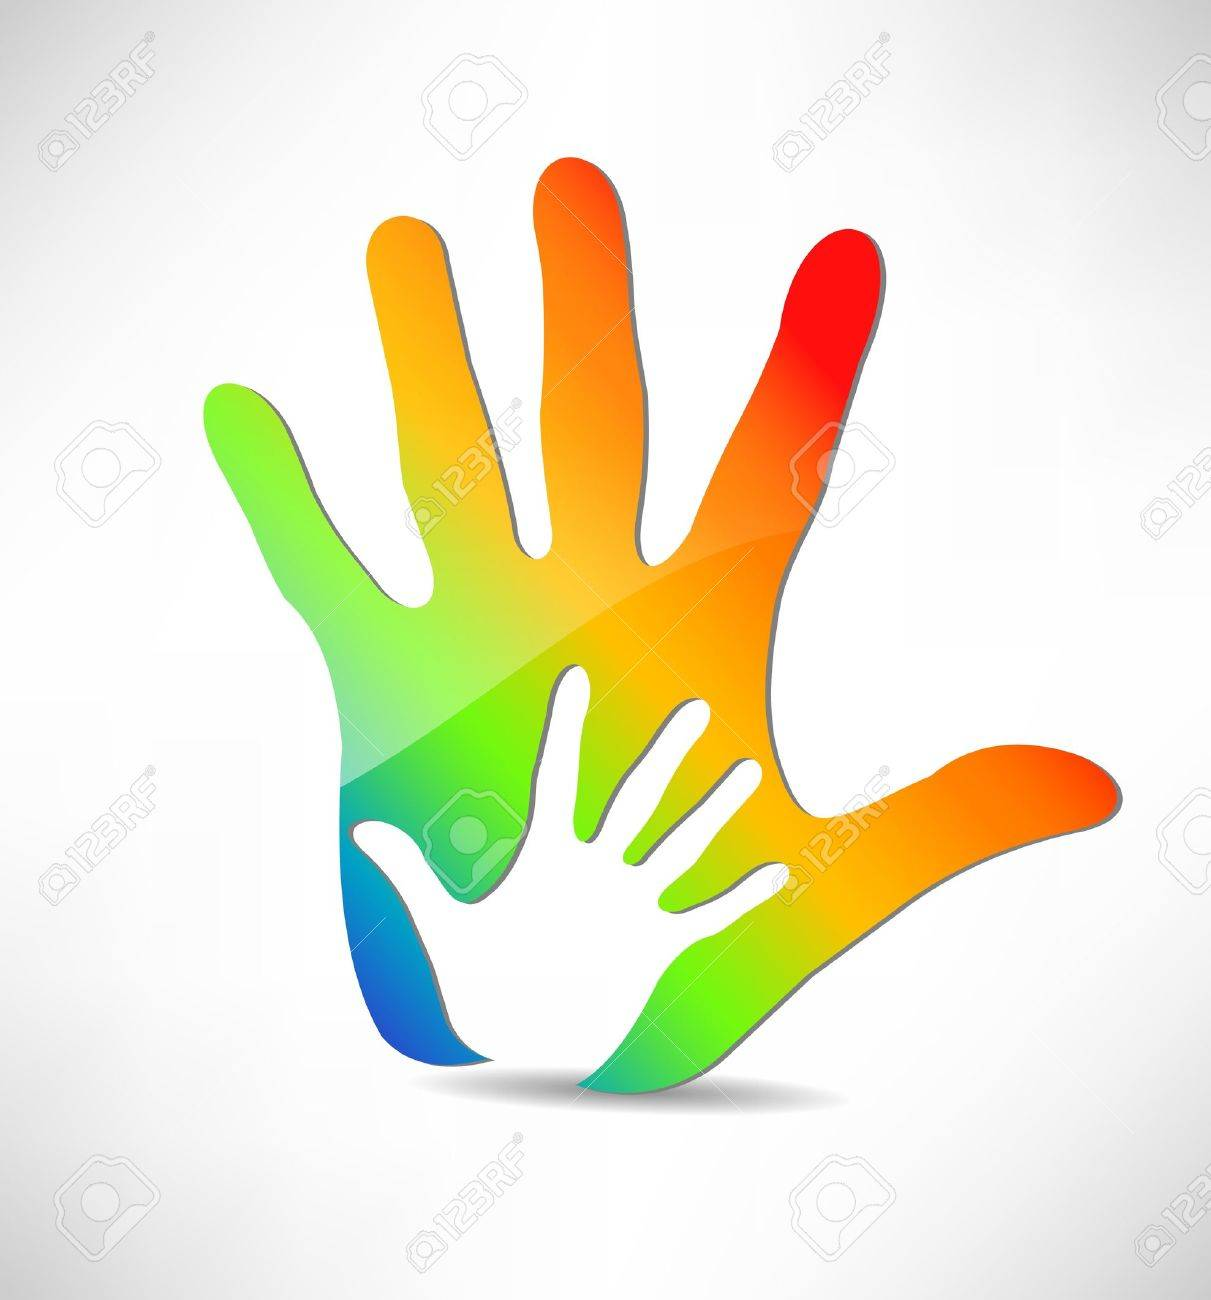 Hands silhouette Stock Vector - 15179151